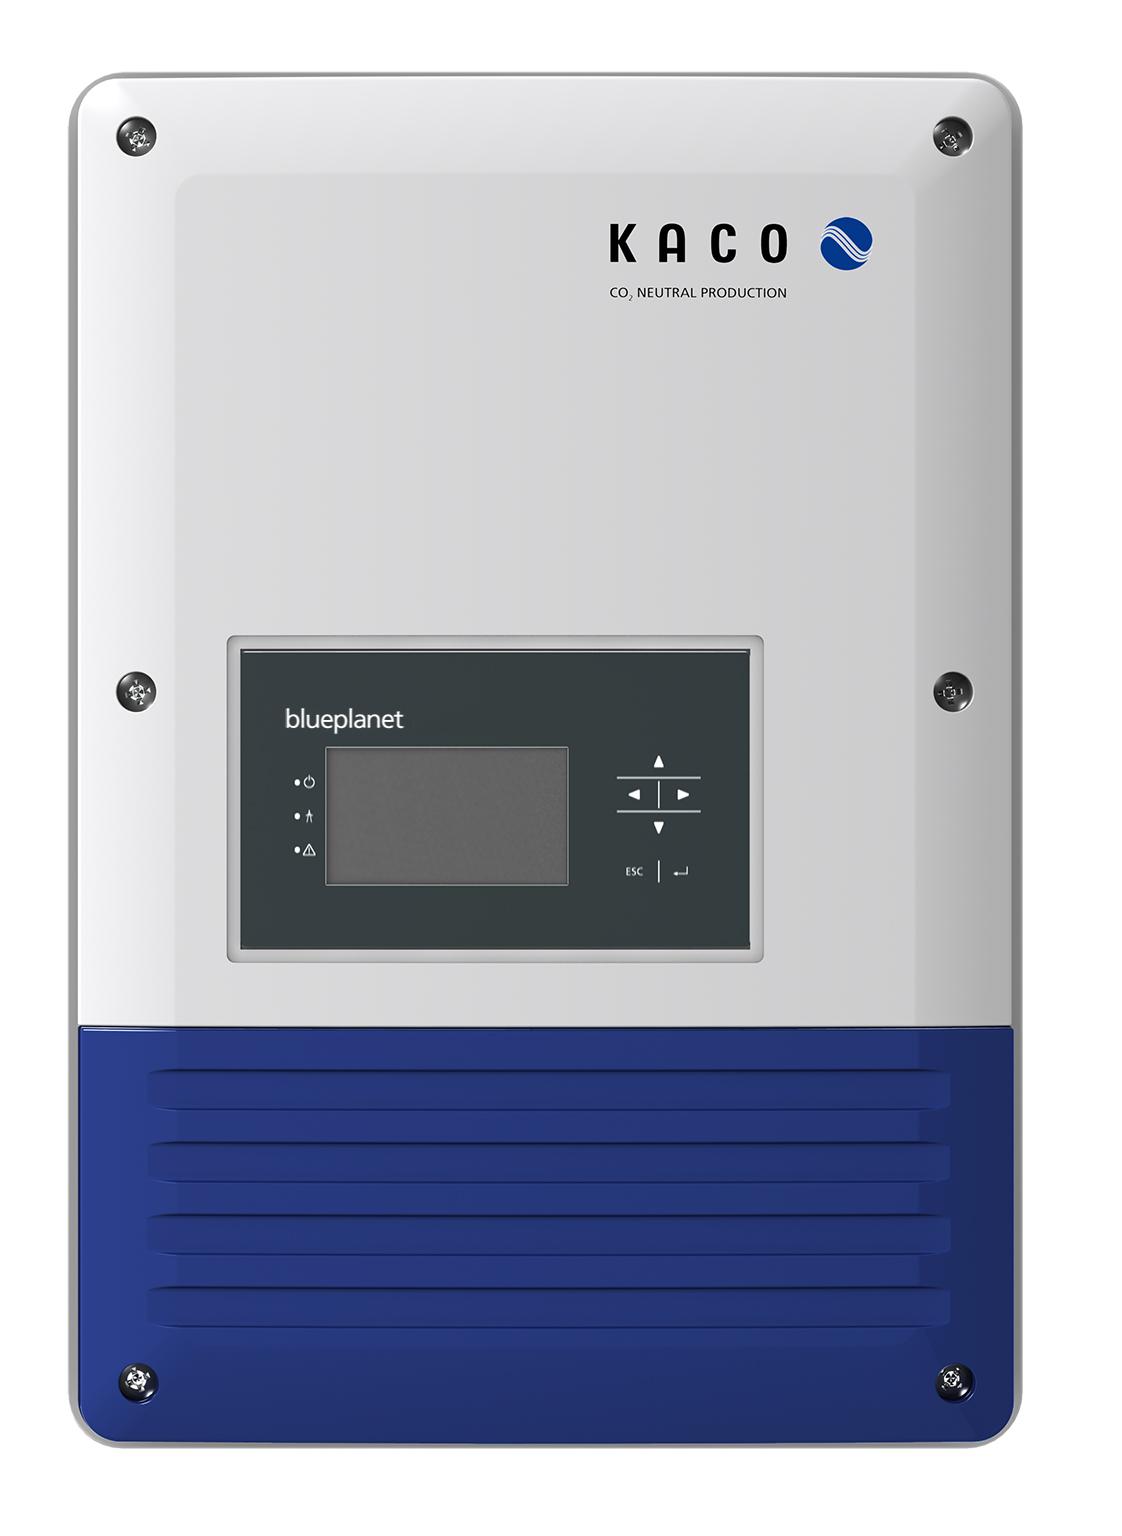 1 Stk Kaco blueplanet 10.0 TL3 3ph IP65 2 MPP-Tracker  PVI50100--